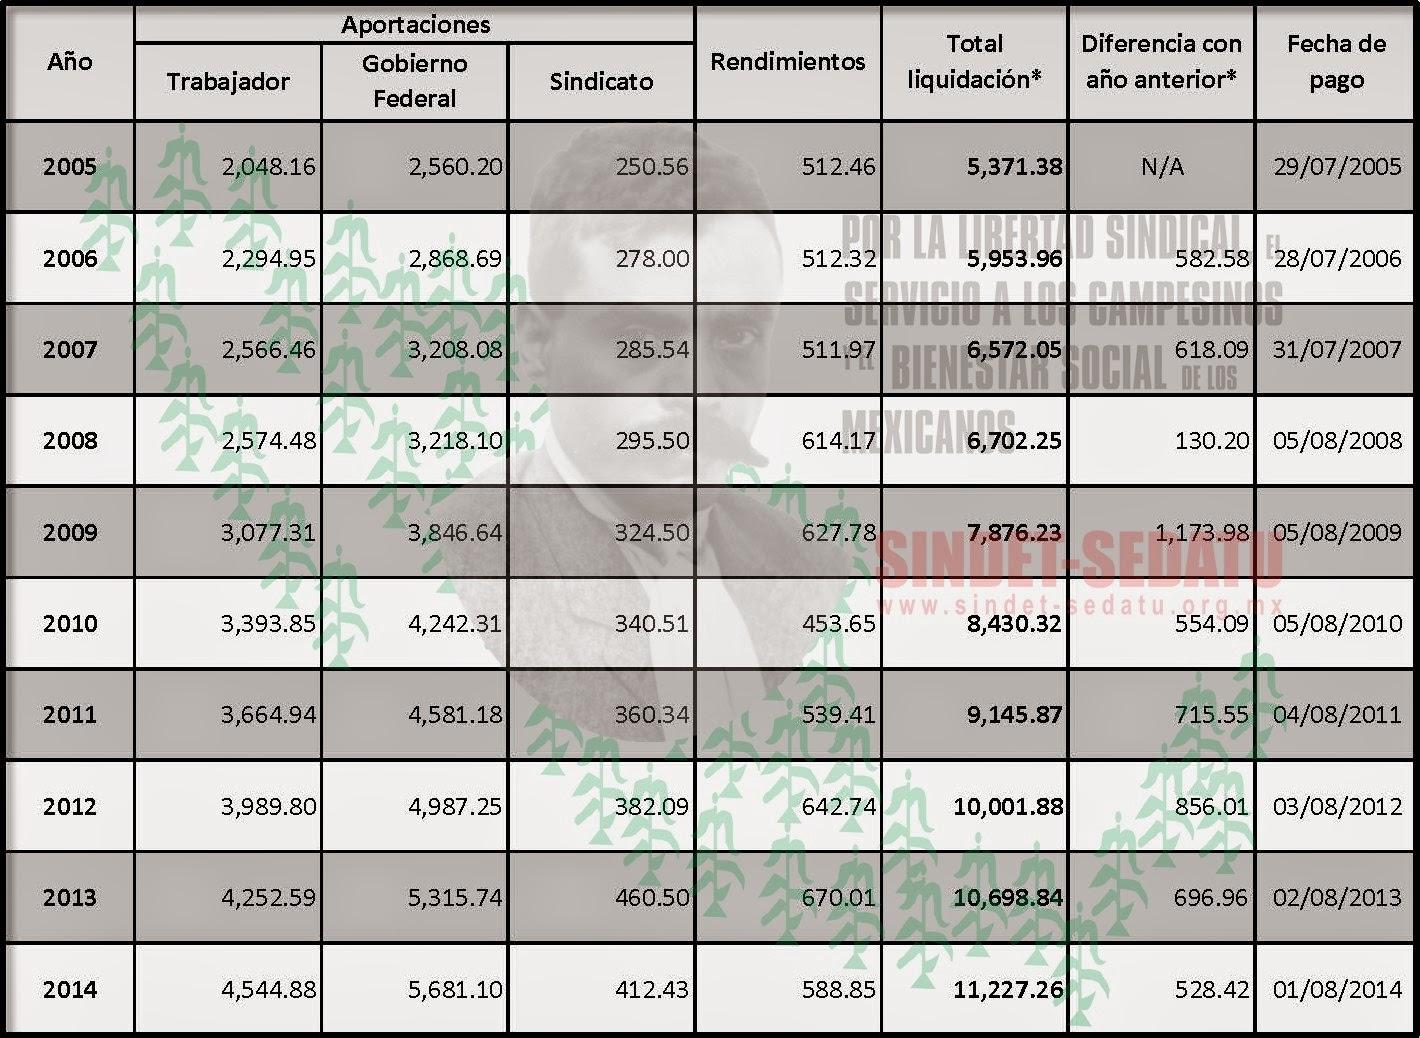 http://sindet-sedatu.org.mx/web/doctos/Resumen_FONAC_14.pdf